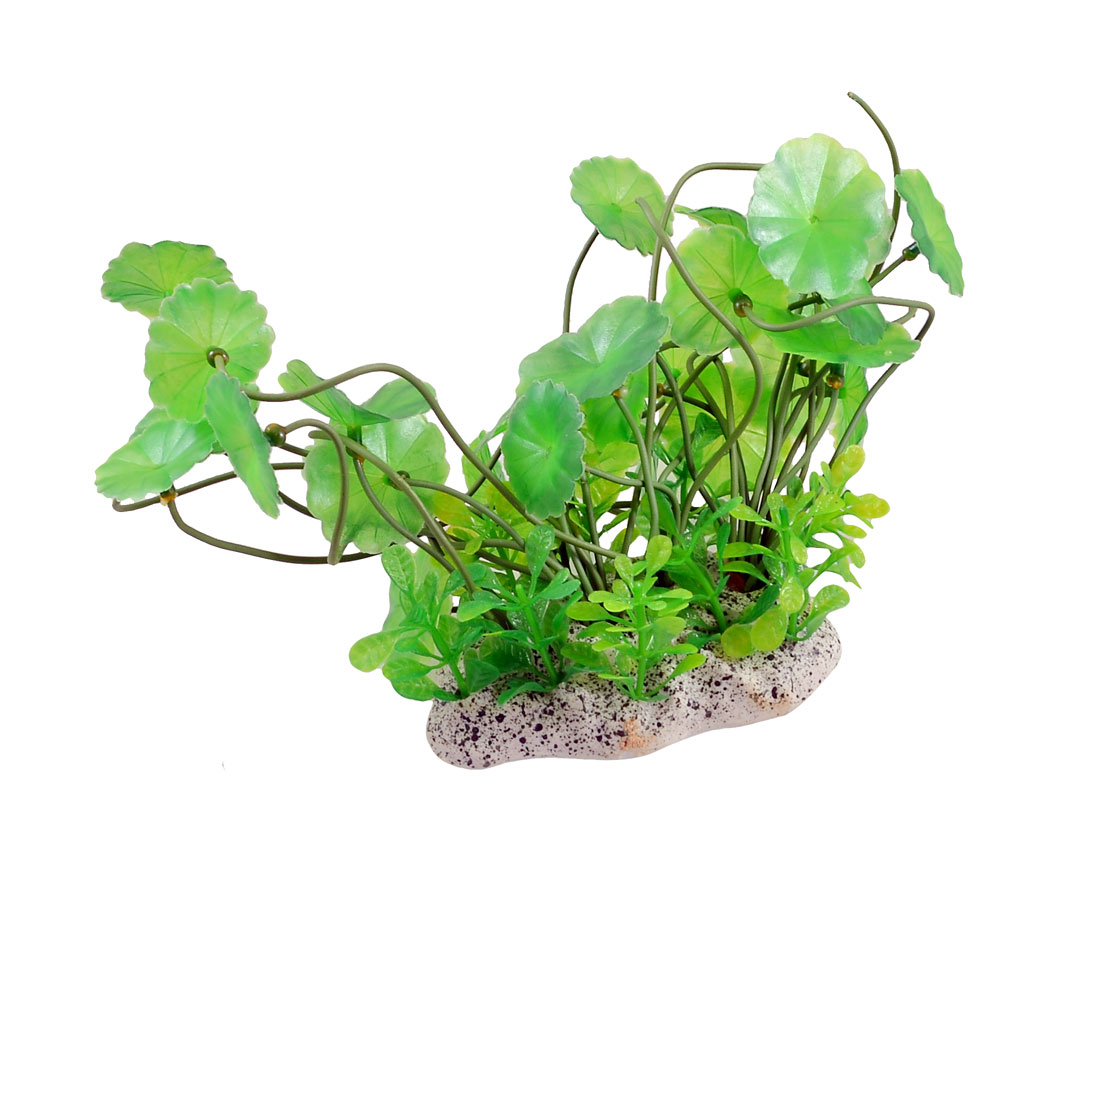 "Fish Tank Aquarium Ornament Plastic Green Grass Artificial Plant 5.5"" Height"